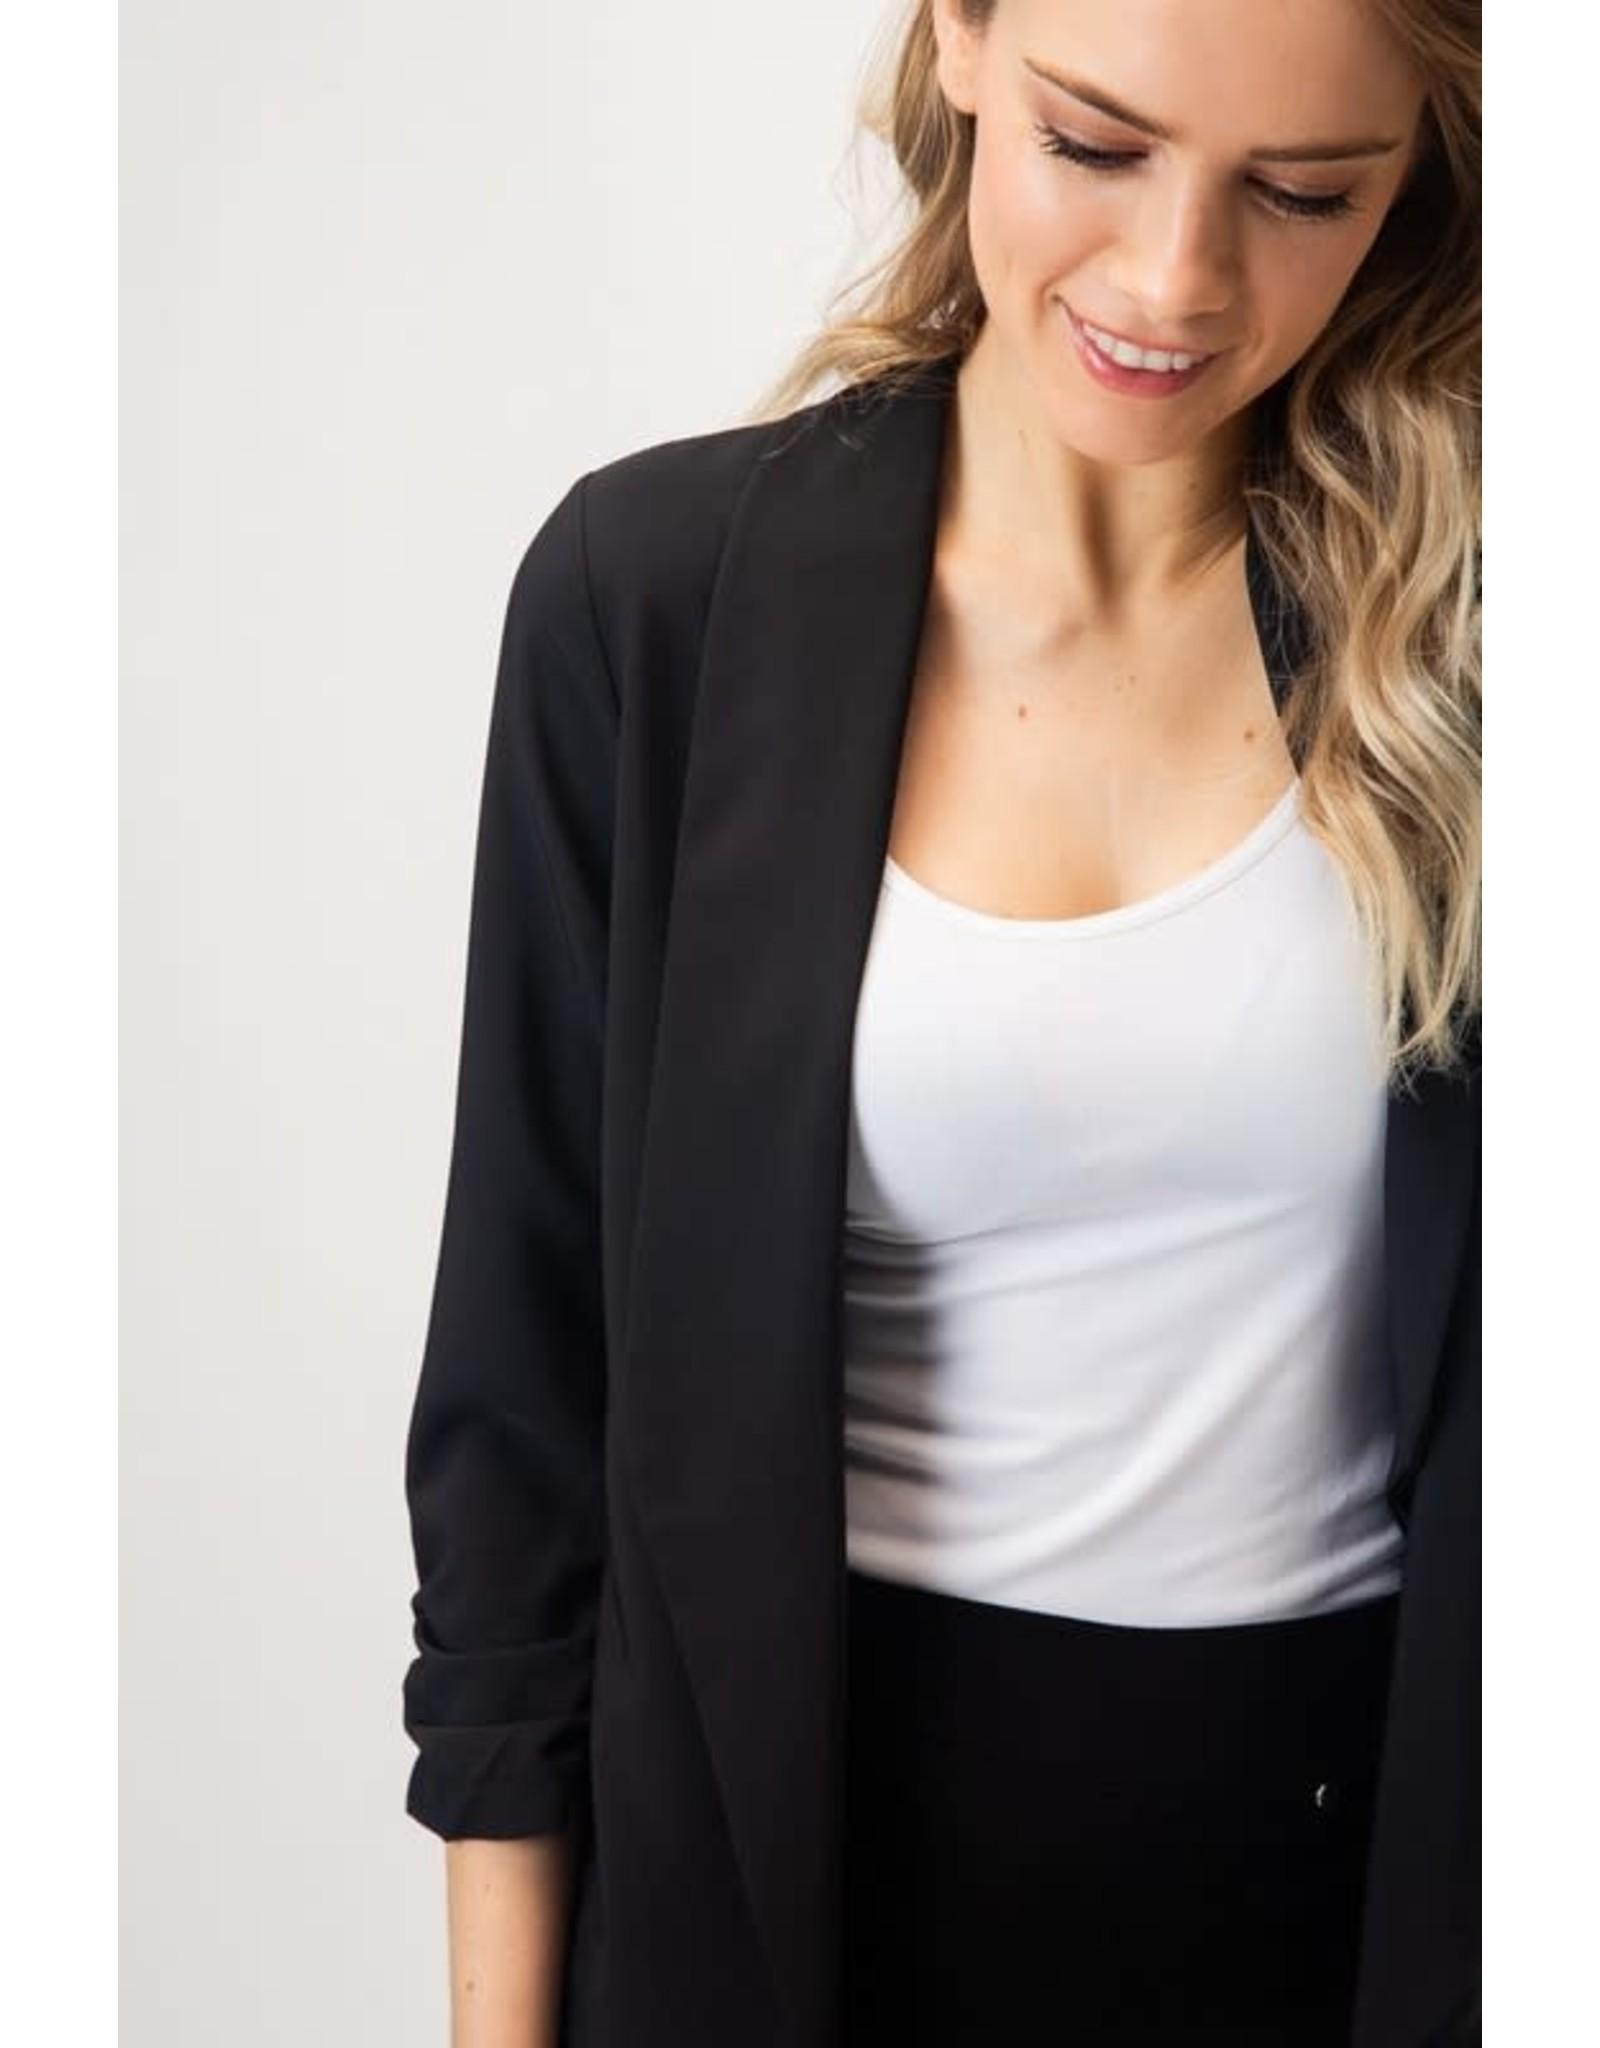 fashiongo DOWN TO BUSINESS Black Blazer